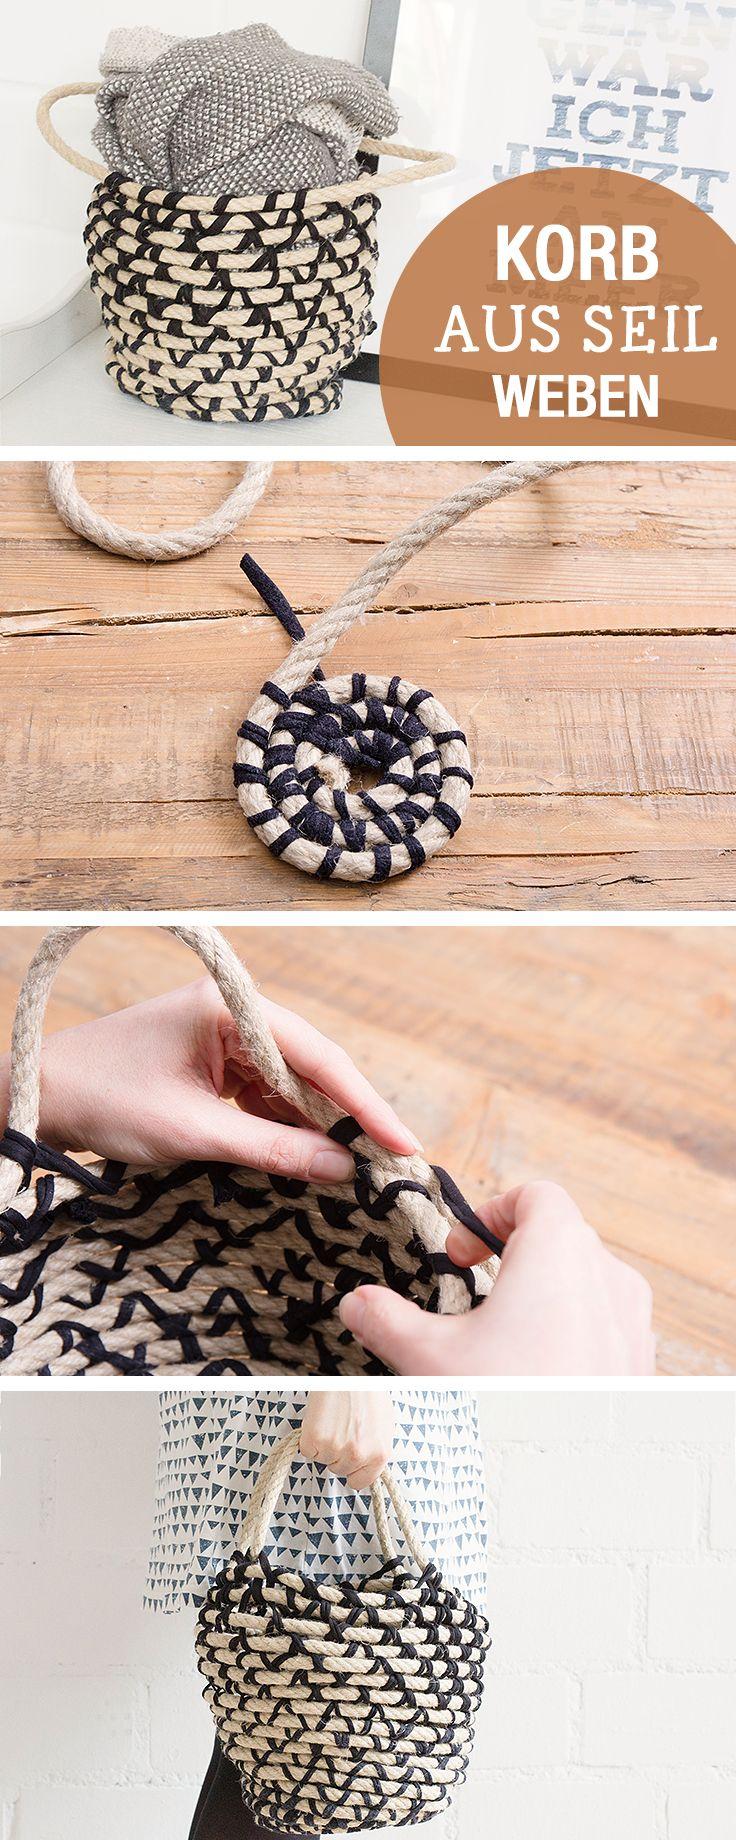 DIY-Anleitung: Korb aus Seil weben, Wohnaccessoires selbermachen / diy living tutorial: how to weave a basket with rope, home decor via DaWanda.com                                                                                                                                                      Mehr